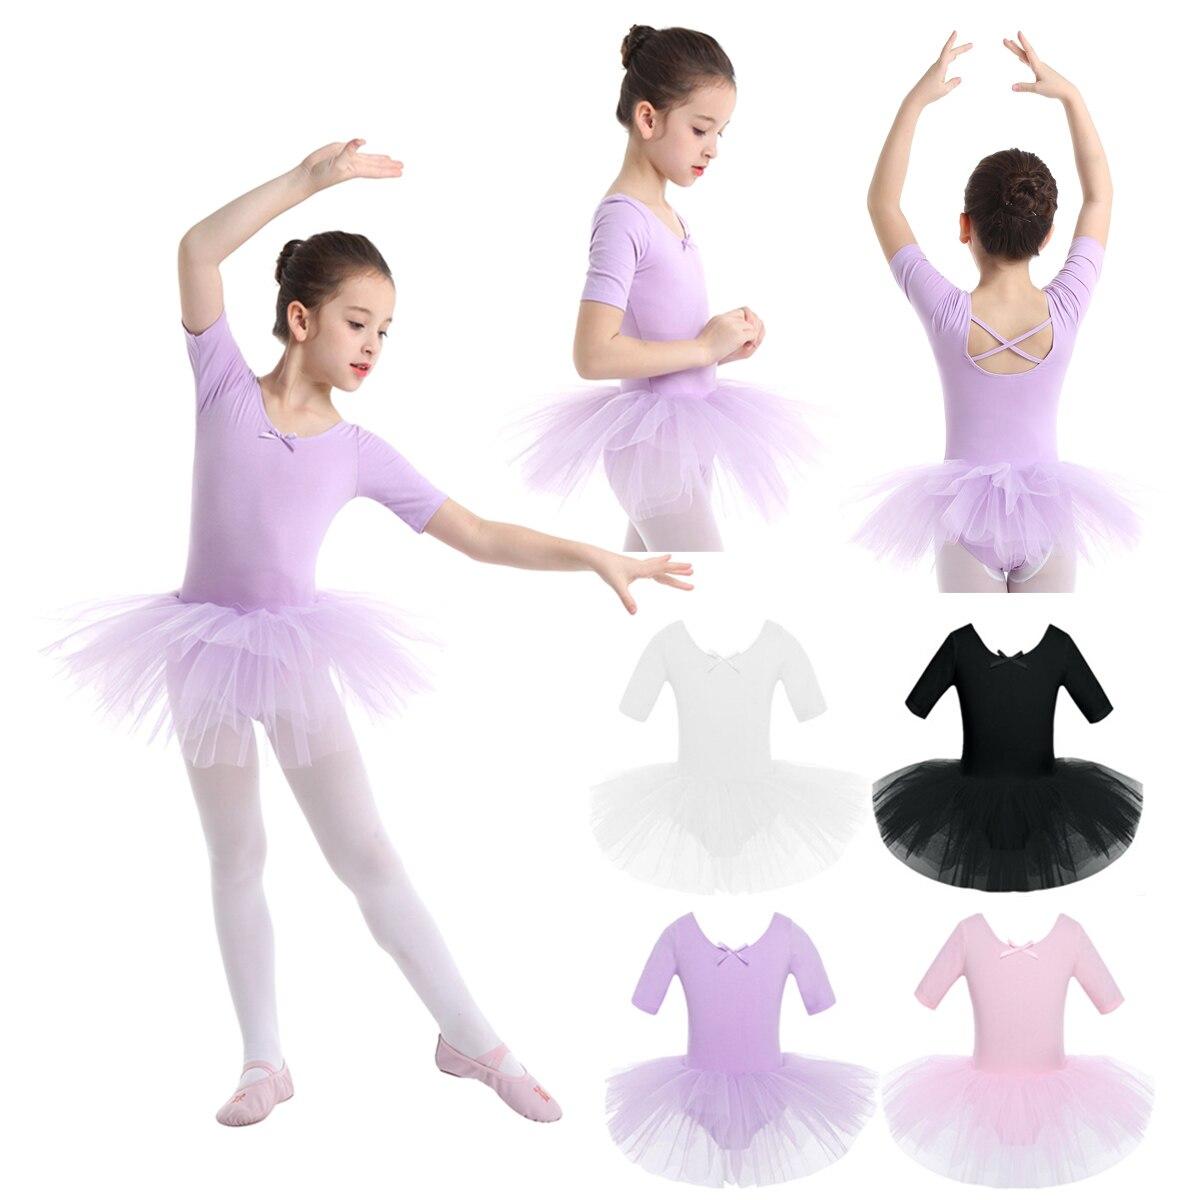 2-10 Years Kids Girls Tutu Ballerina Dancewear Short Sleeve Cotton Tulle Ballet Dance Gymnastics Leotard Performance Tutu Dress